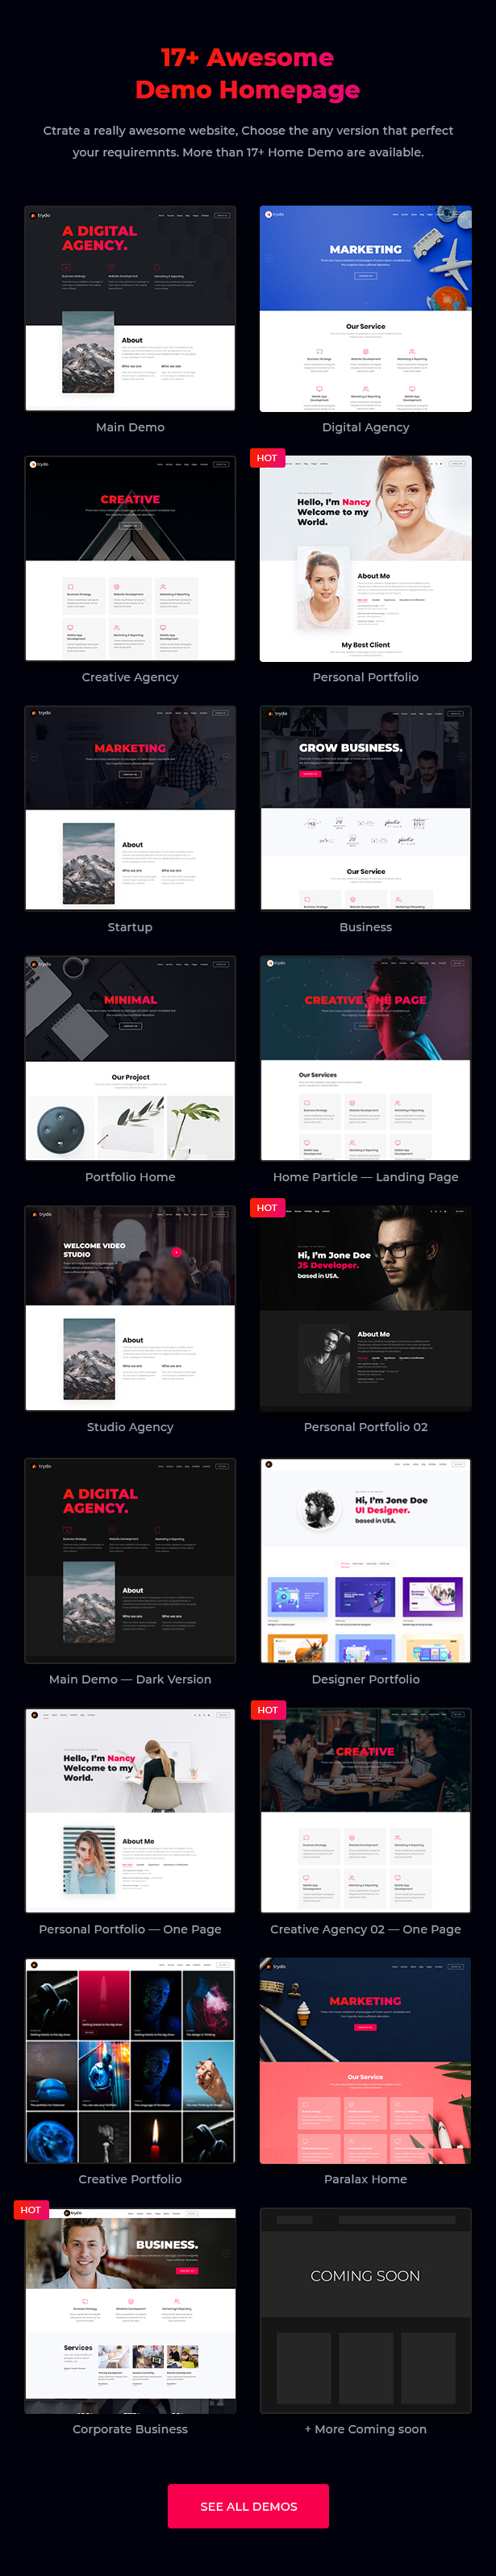 Trydo - Creative Agency & Portfolio WordPress Theme - 6